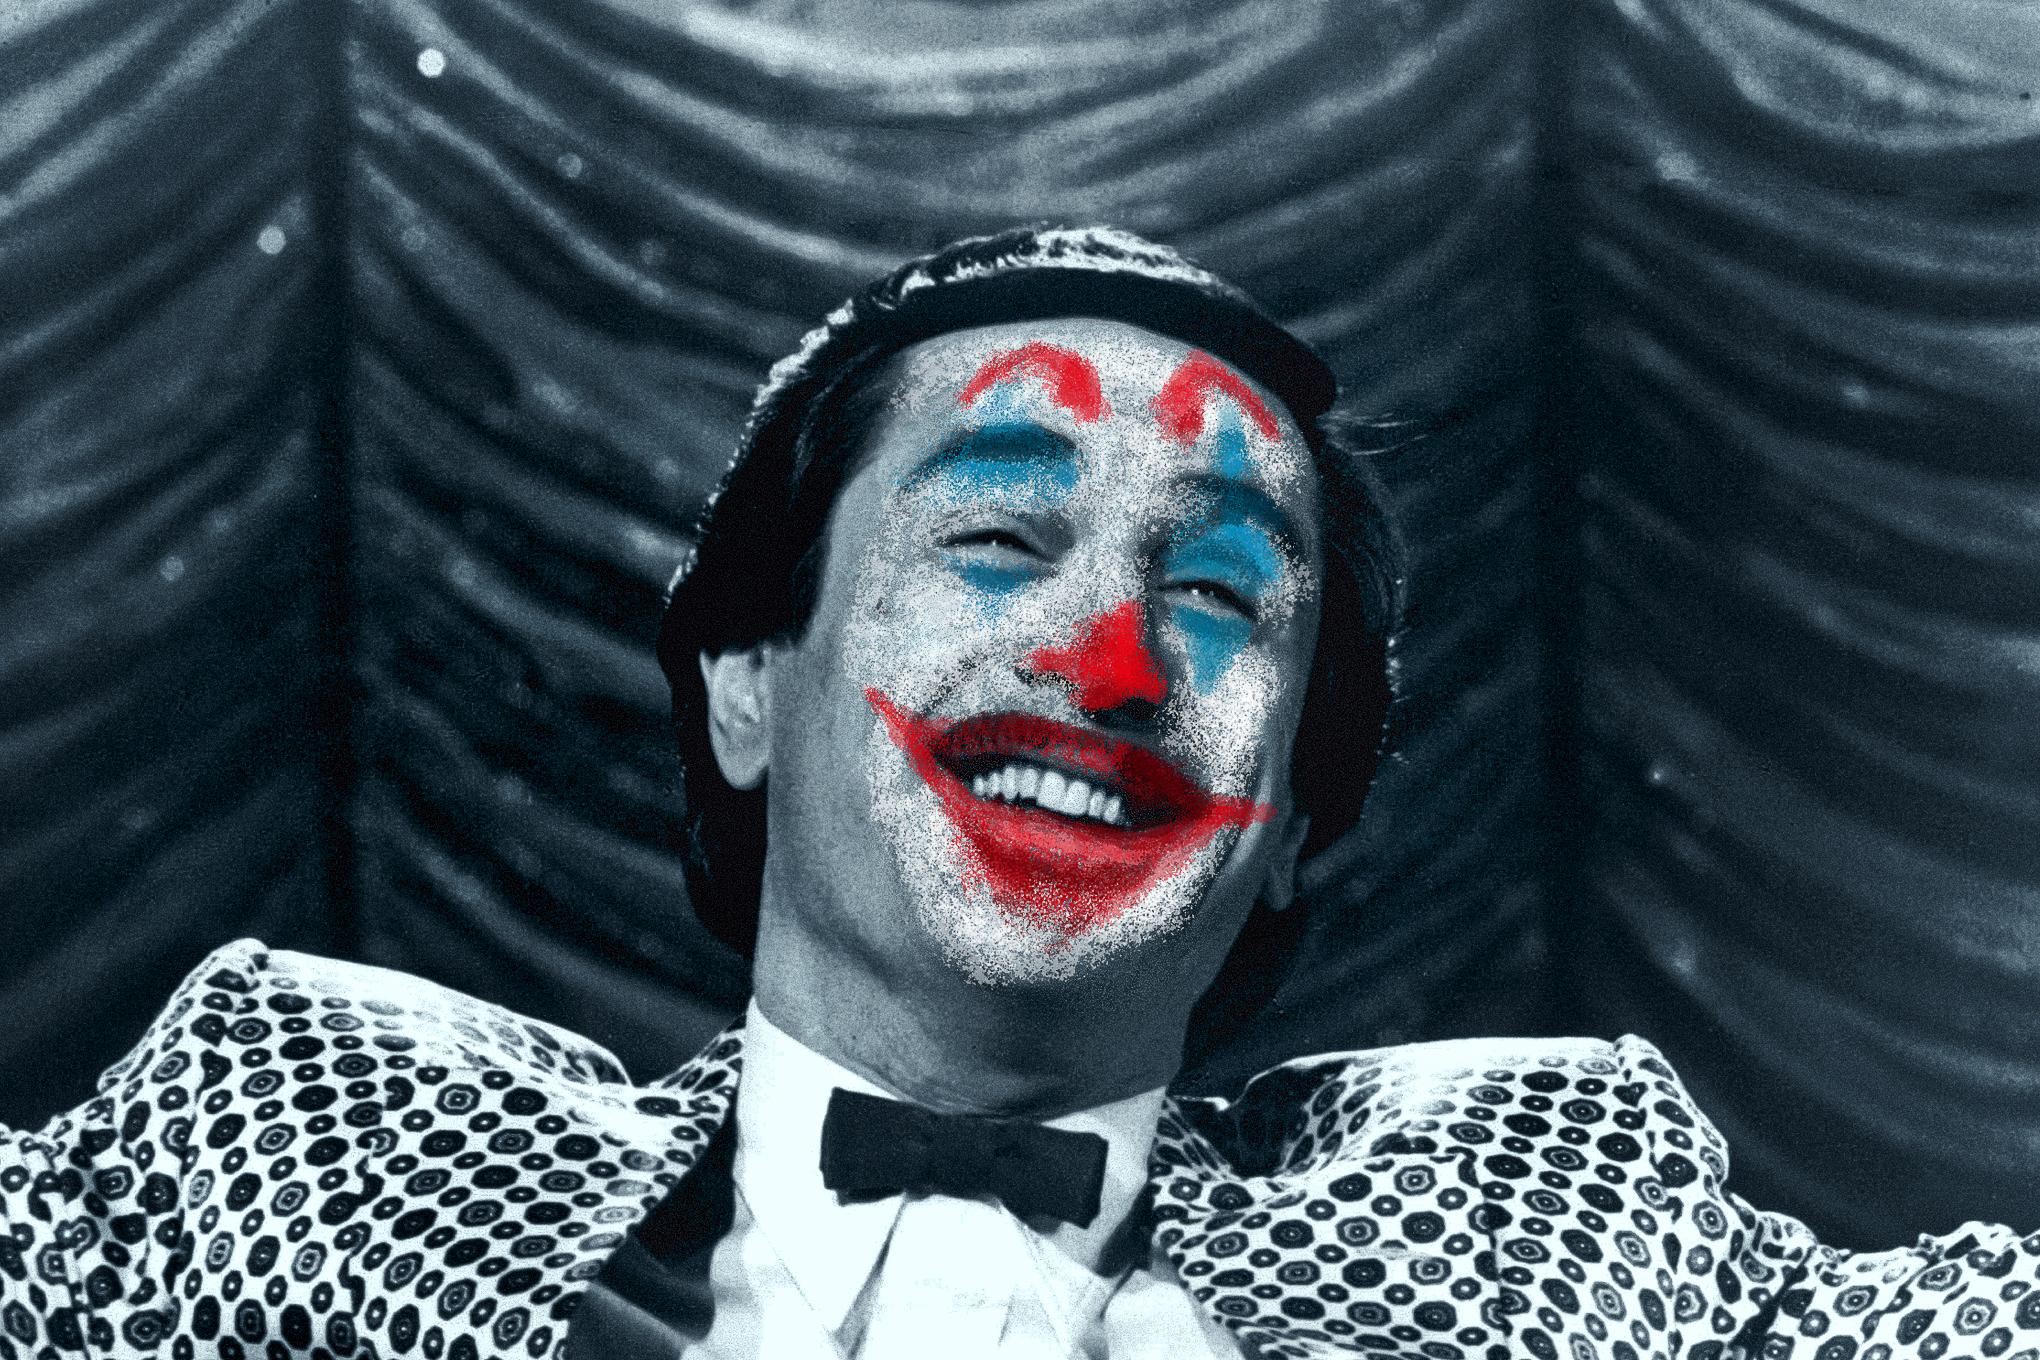 Robert de Niro photo illustration as Joker